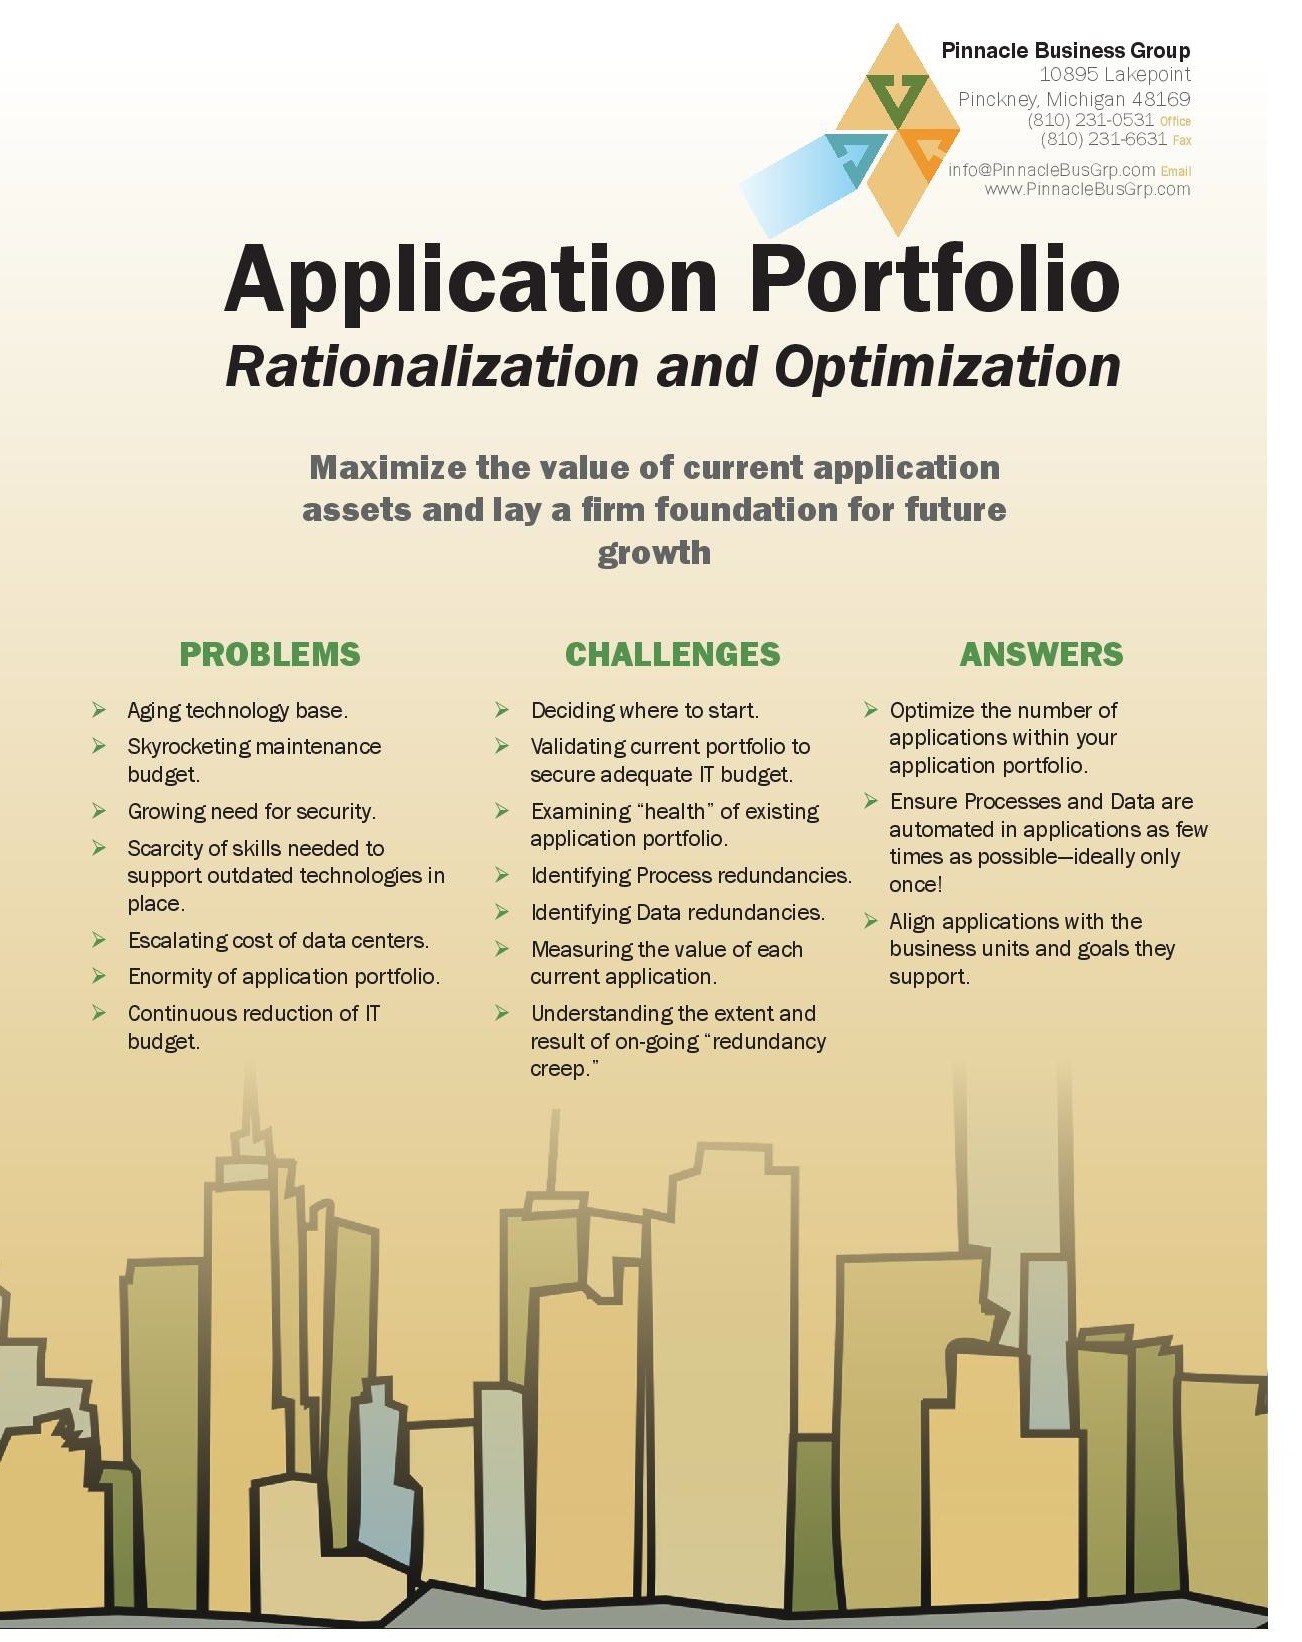 View our Application Portfolio Rationalization & Optimization Brochure